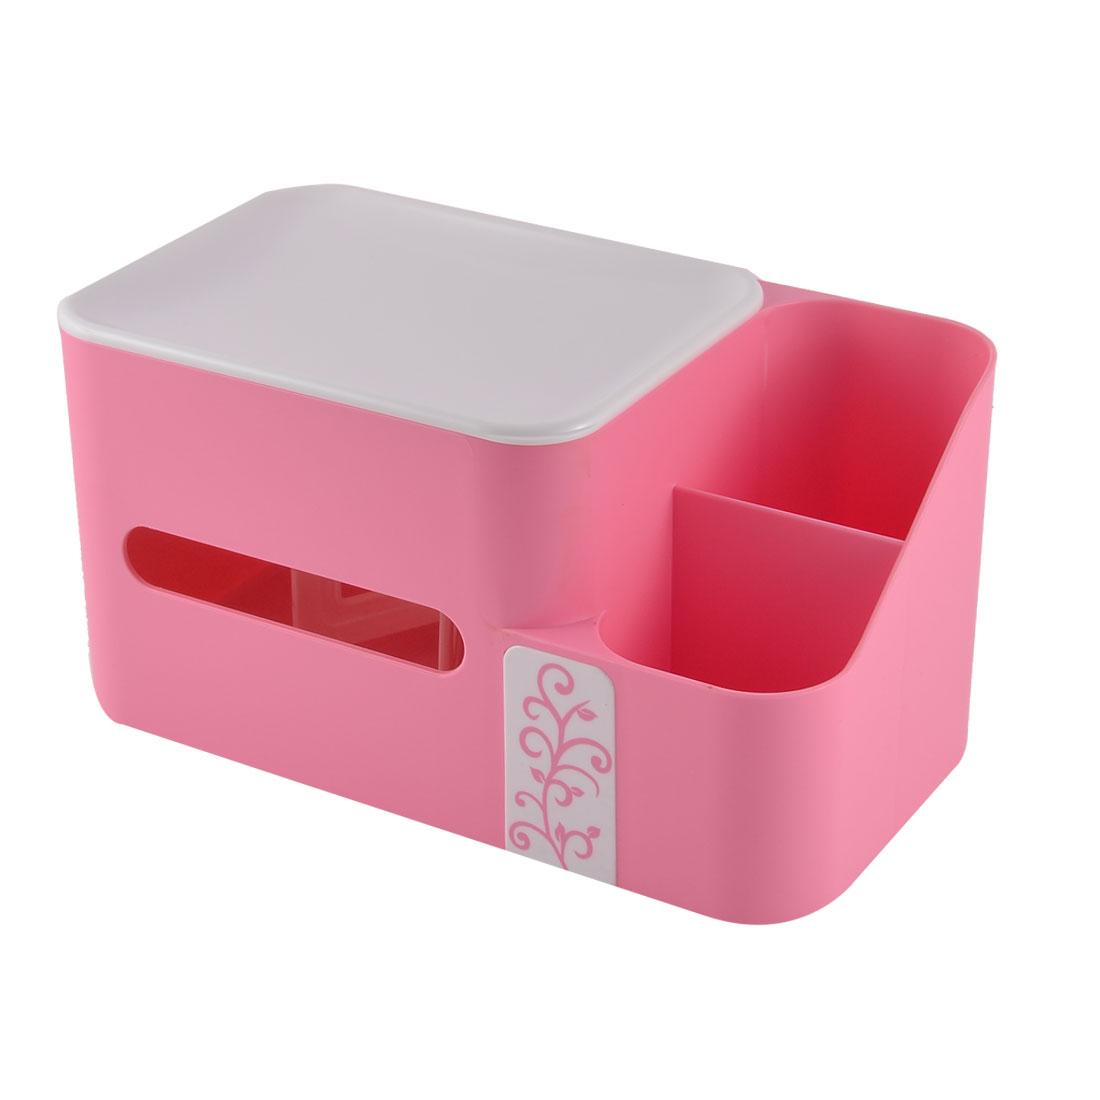 Home Office Desk Plastic Special Spring Design Pen Tissue Holder Pink w Storage Box Case